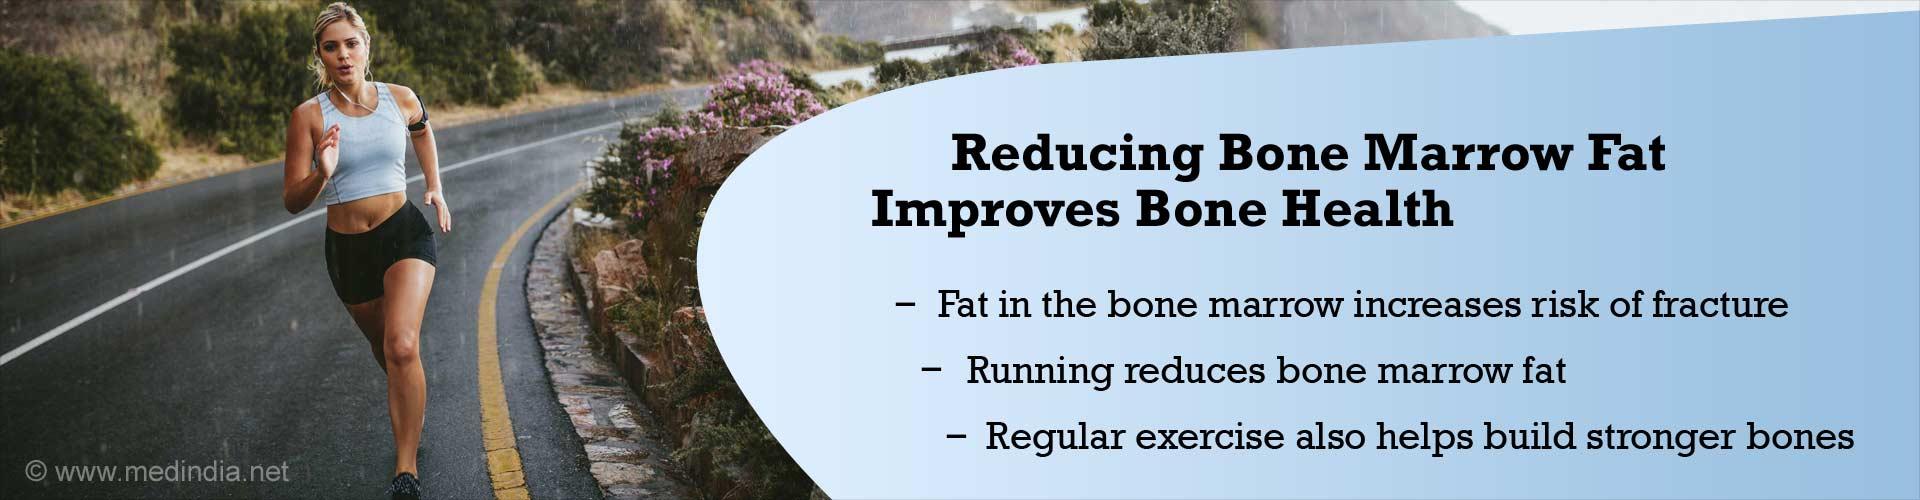 Reducing bone marrow fat improves bone health - Fat in the bone marrow increases risk of fracture - Running reduces bone marrow fat - Regular exercise also helps build stronger bones